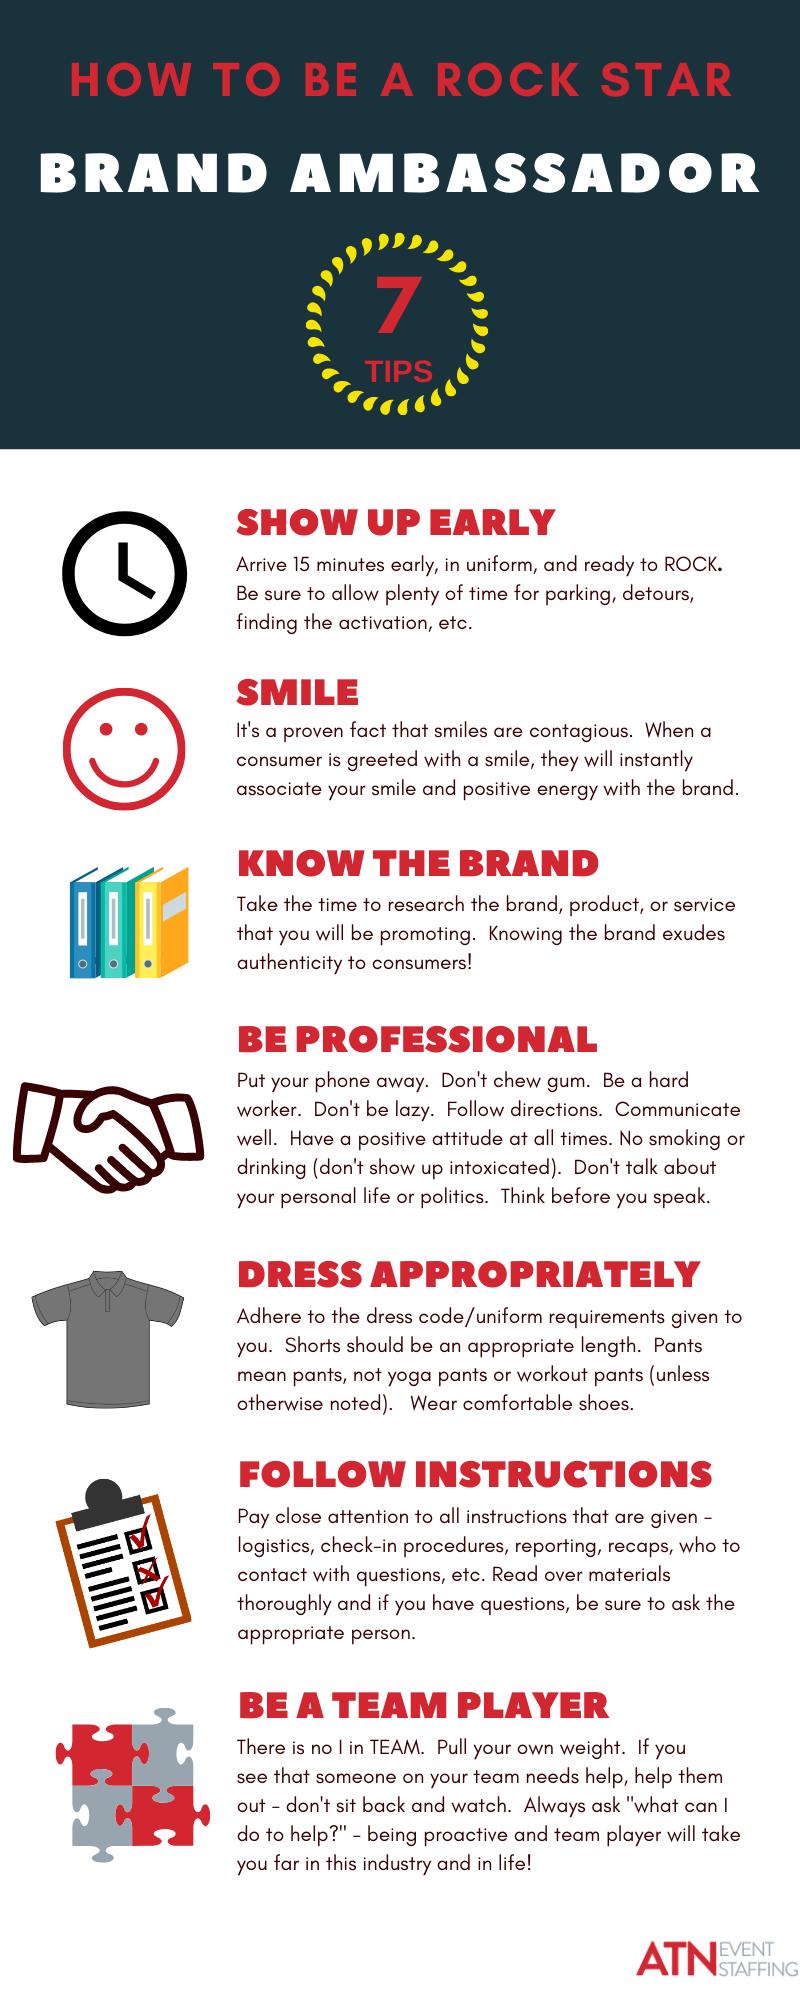 Be the Best Brand Ambassador